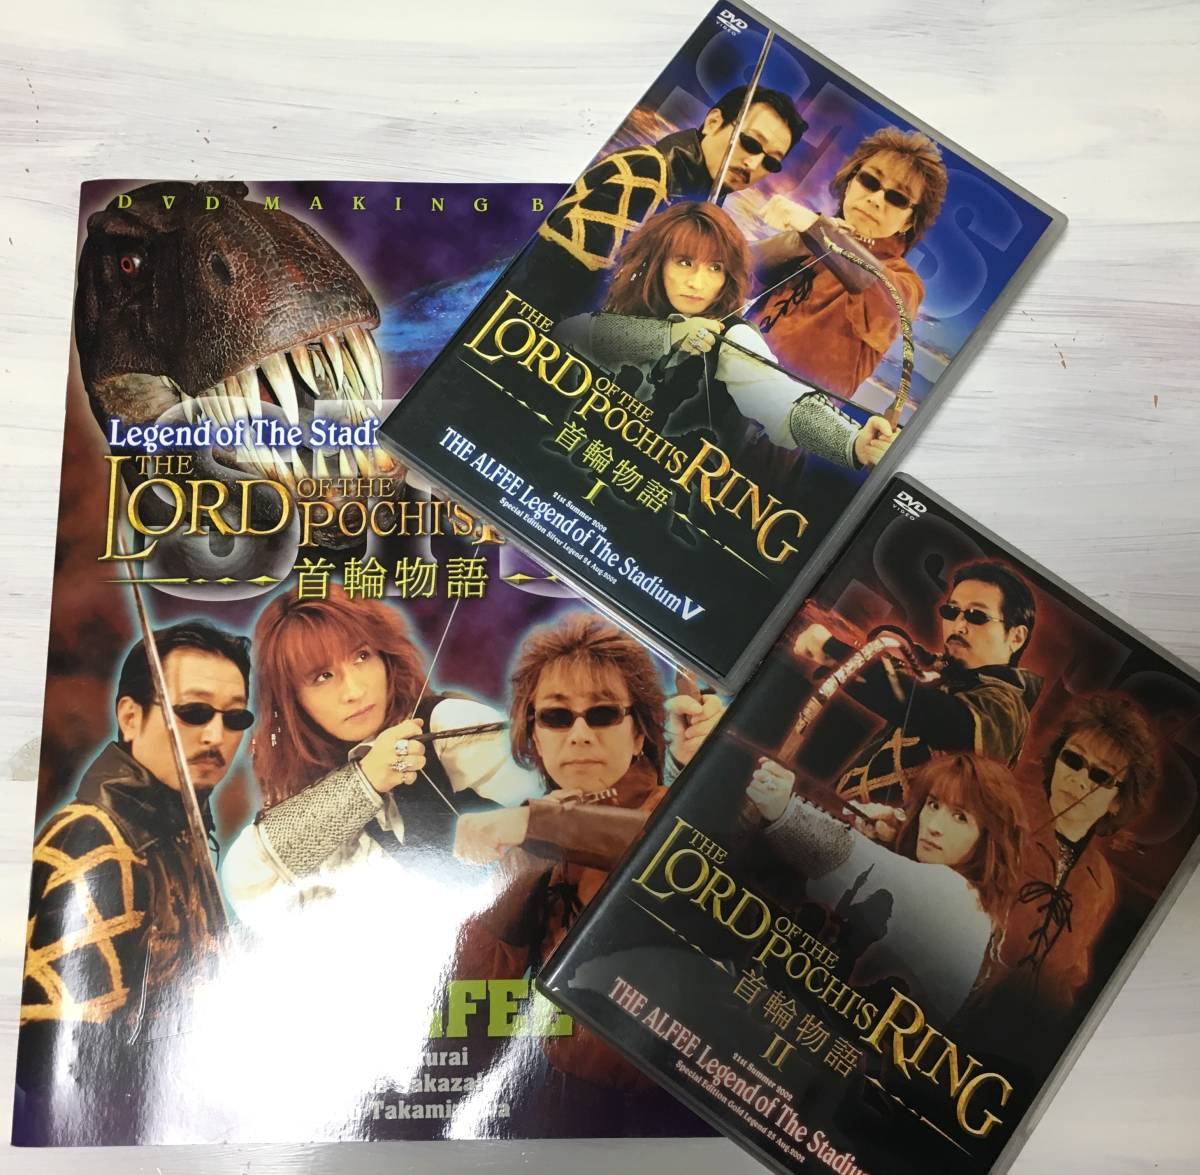 【THE ALFEE】LOAD POCHI'S RING/首輪物語2002.8.25 21th summer/DVDパンフレットⅠ Ⅱ/メイキングブック